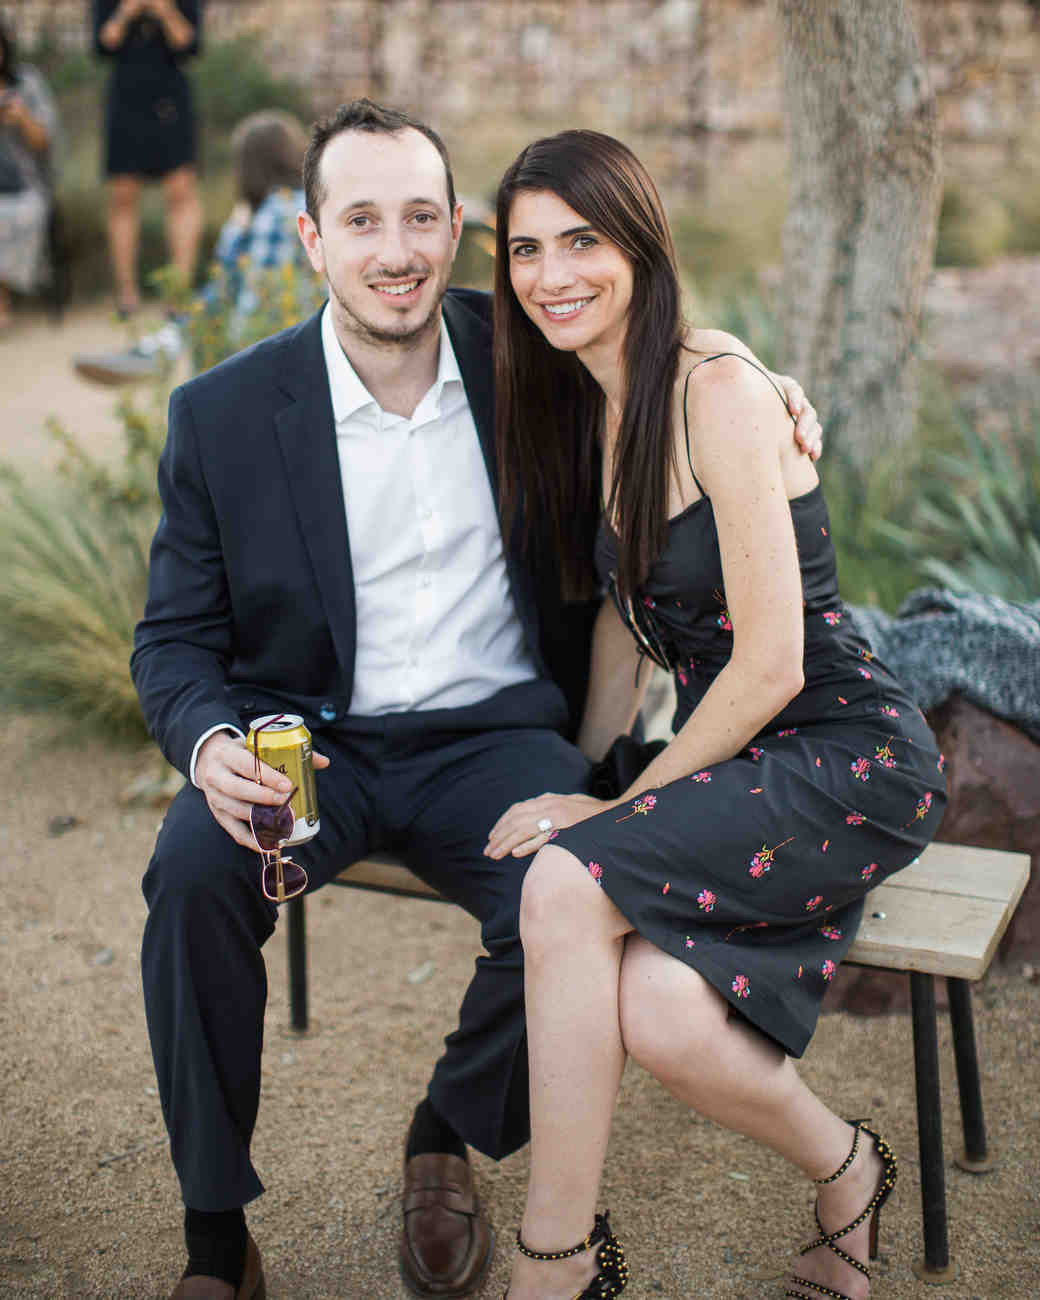 lara-chad-wedding-guests-593-s112306-1115.jpg